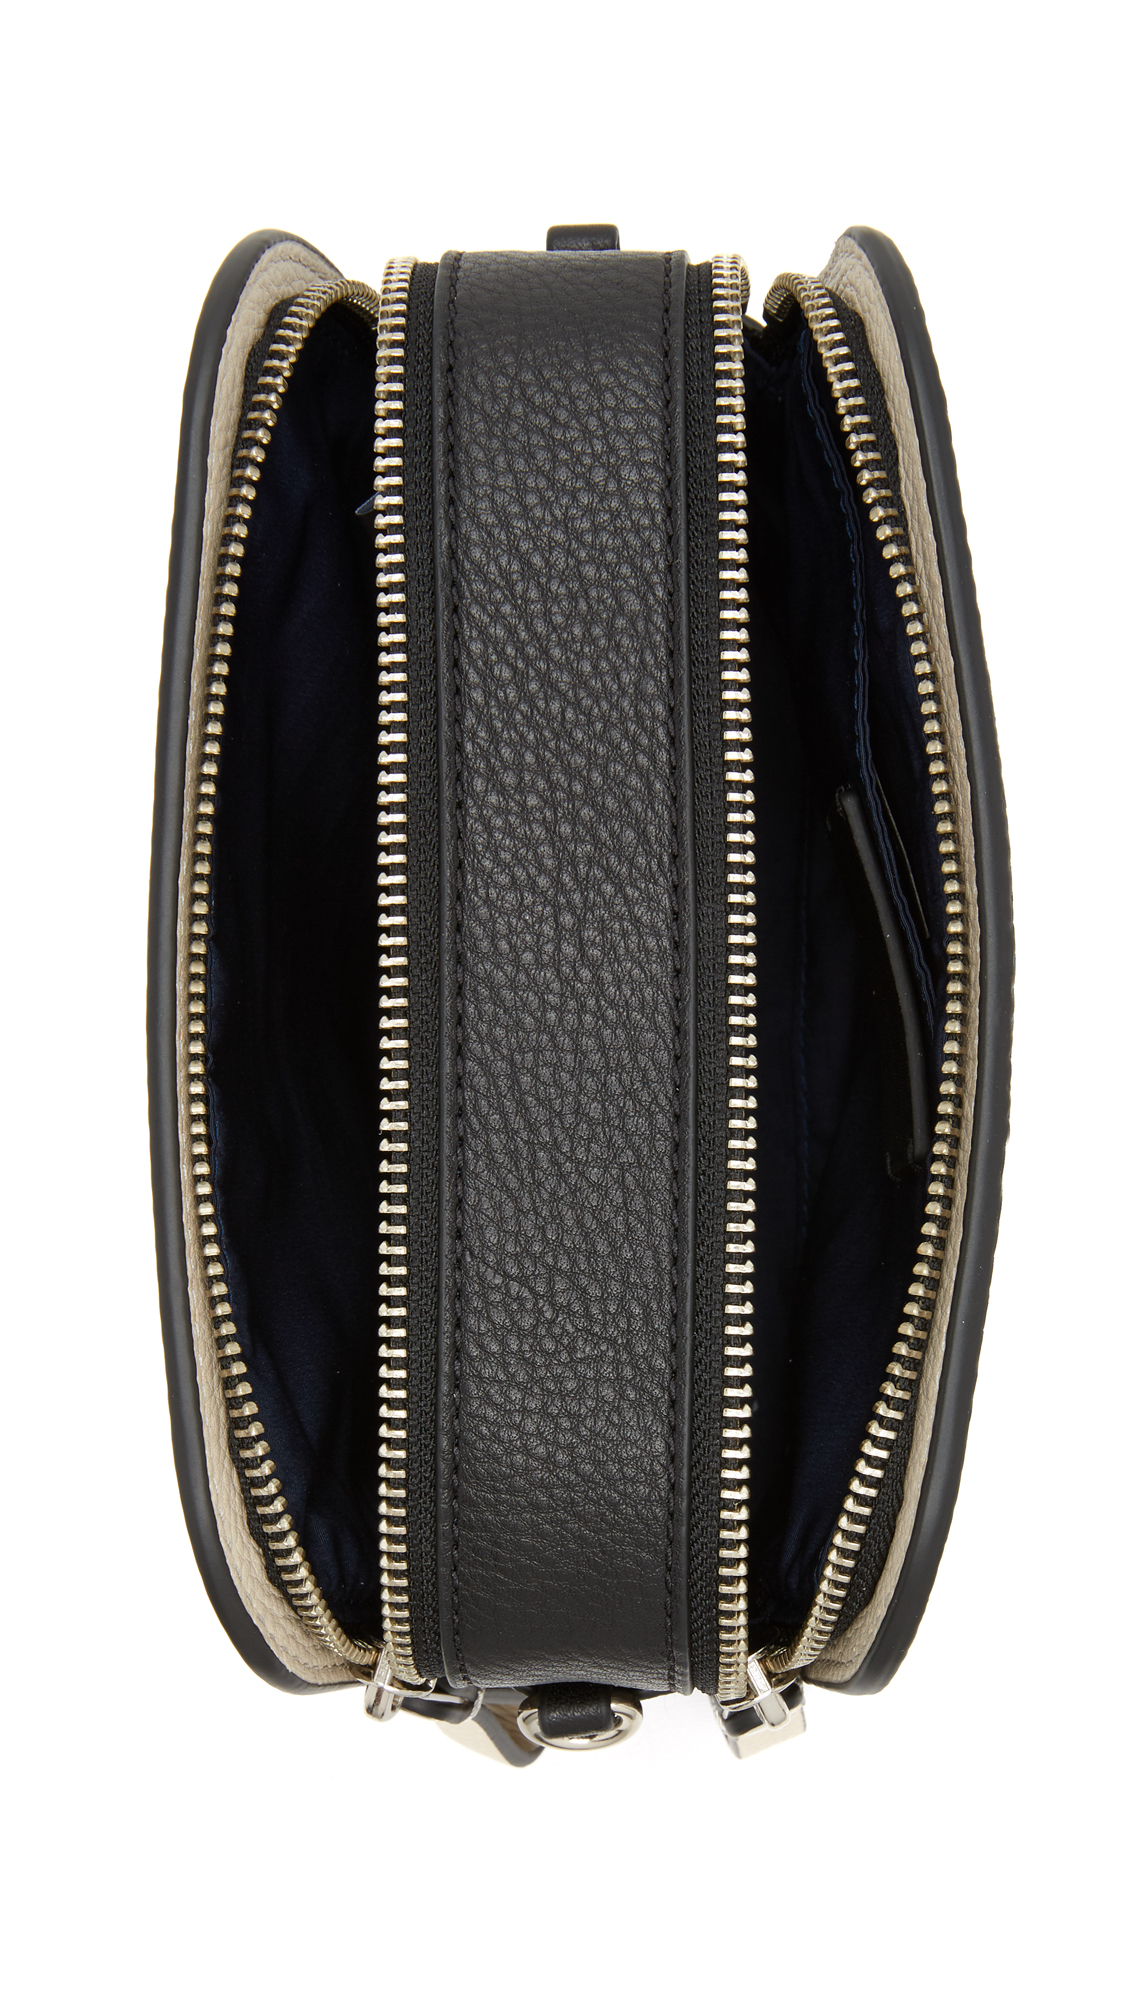 c89b44eb8c0d Lyst - Marc By Marc Jacobs Lux Double Zip Cross Body Bag - Black ...